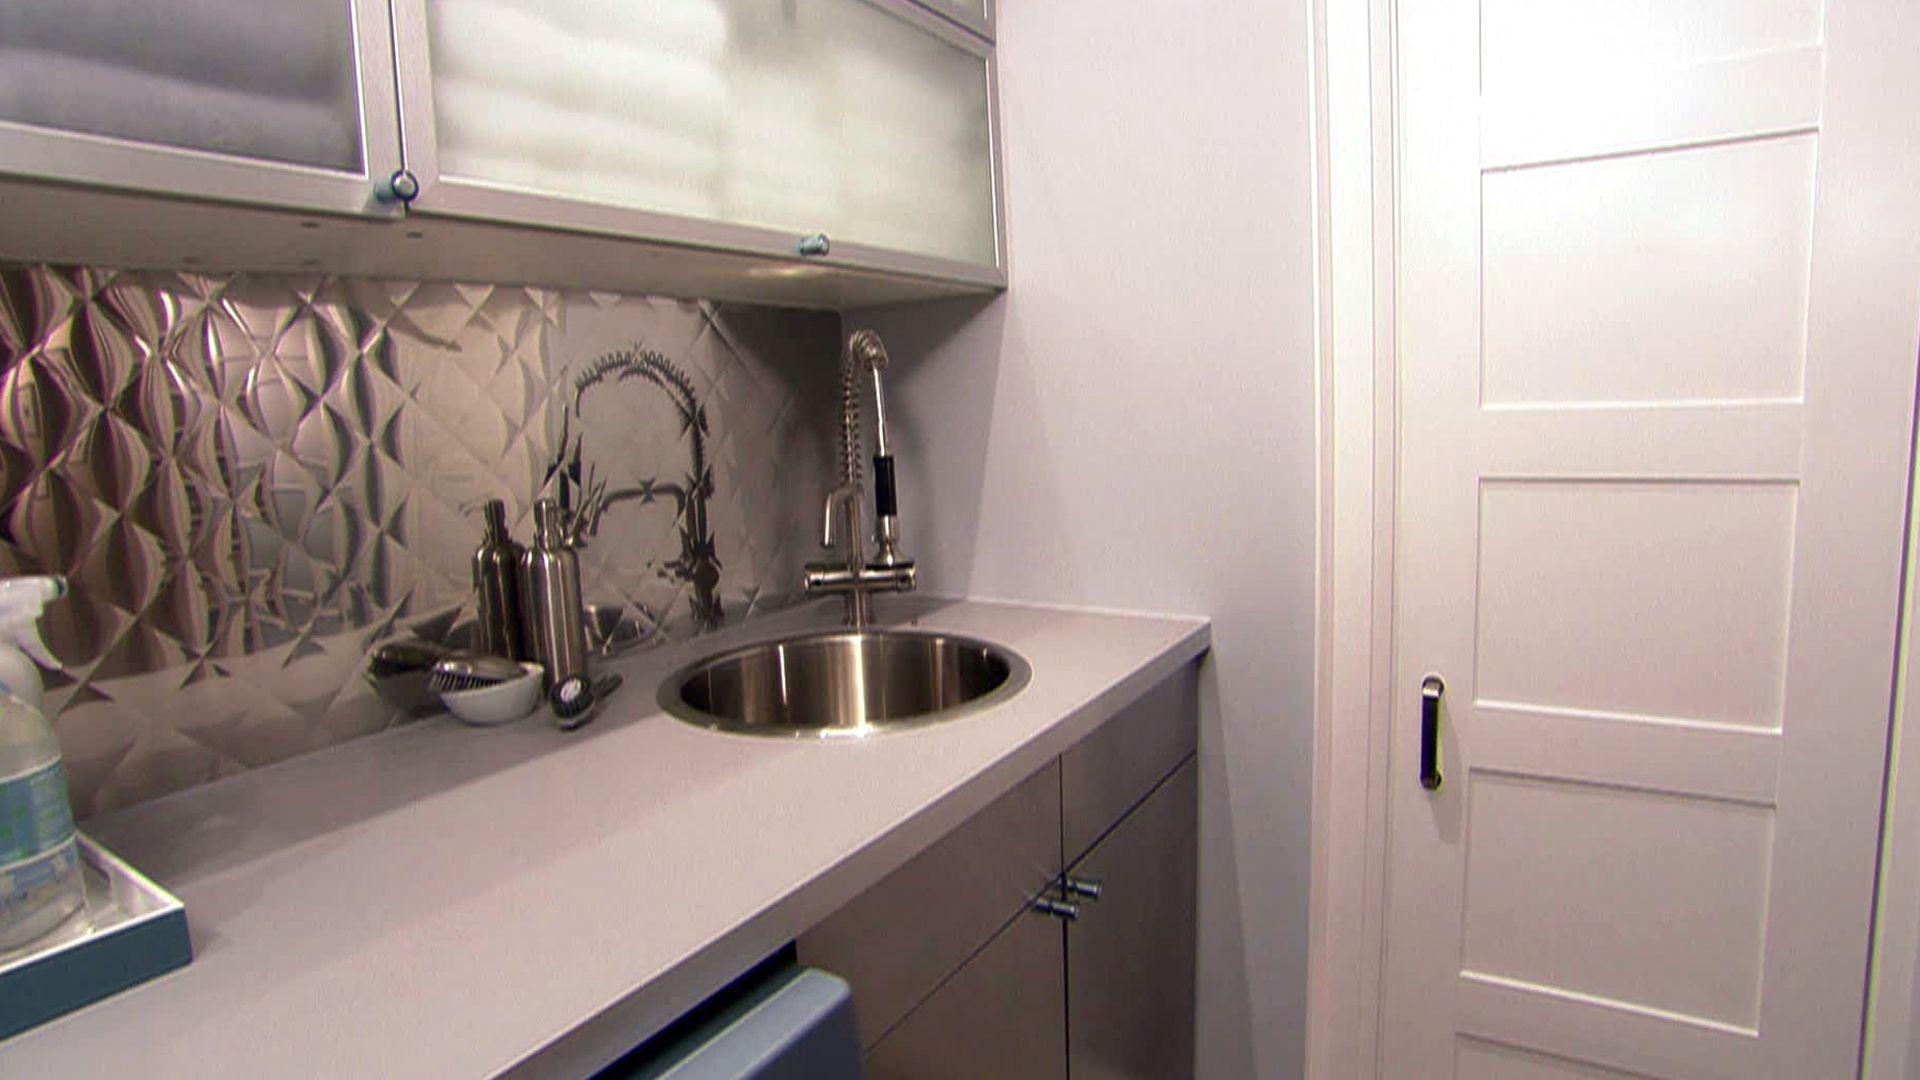 Sarah's sleek, industrial laundry room could make doing laundry enjoyable.